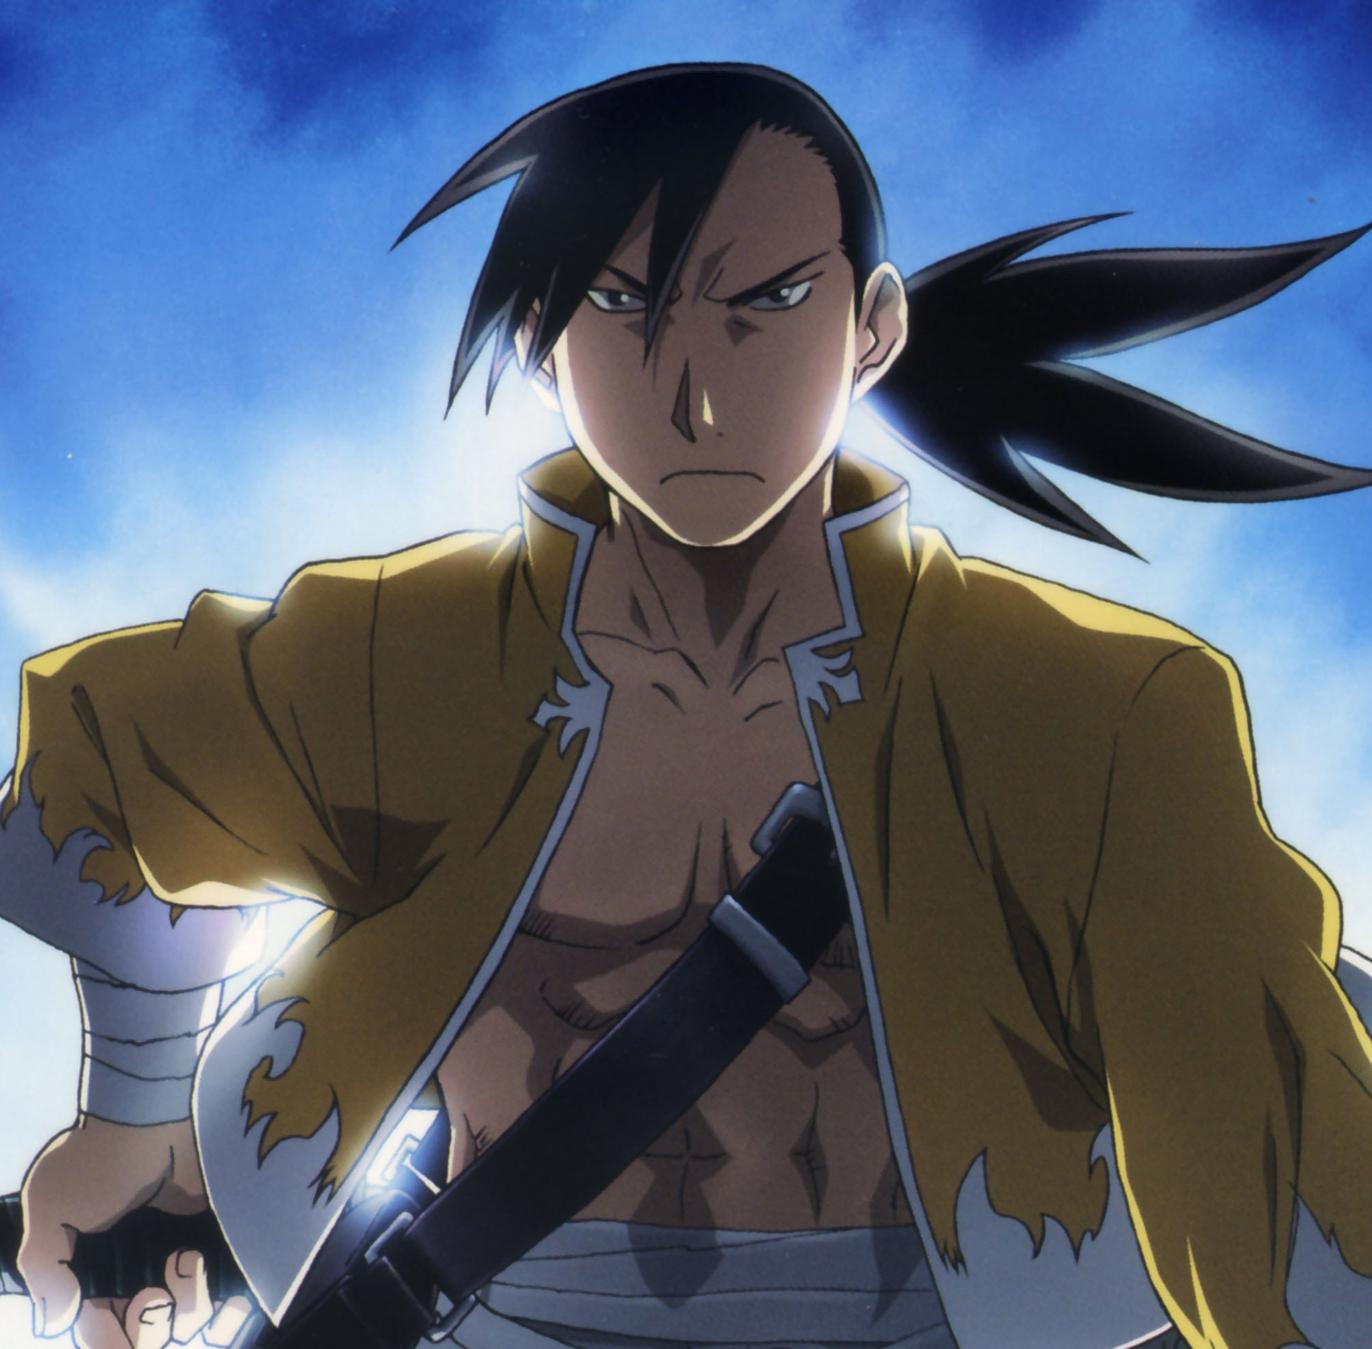 Ling Yao - Fullmetal Alchemist Wiki